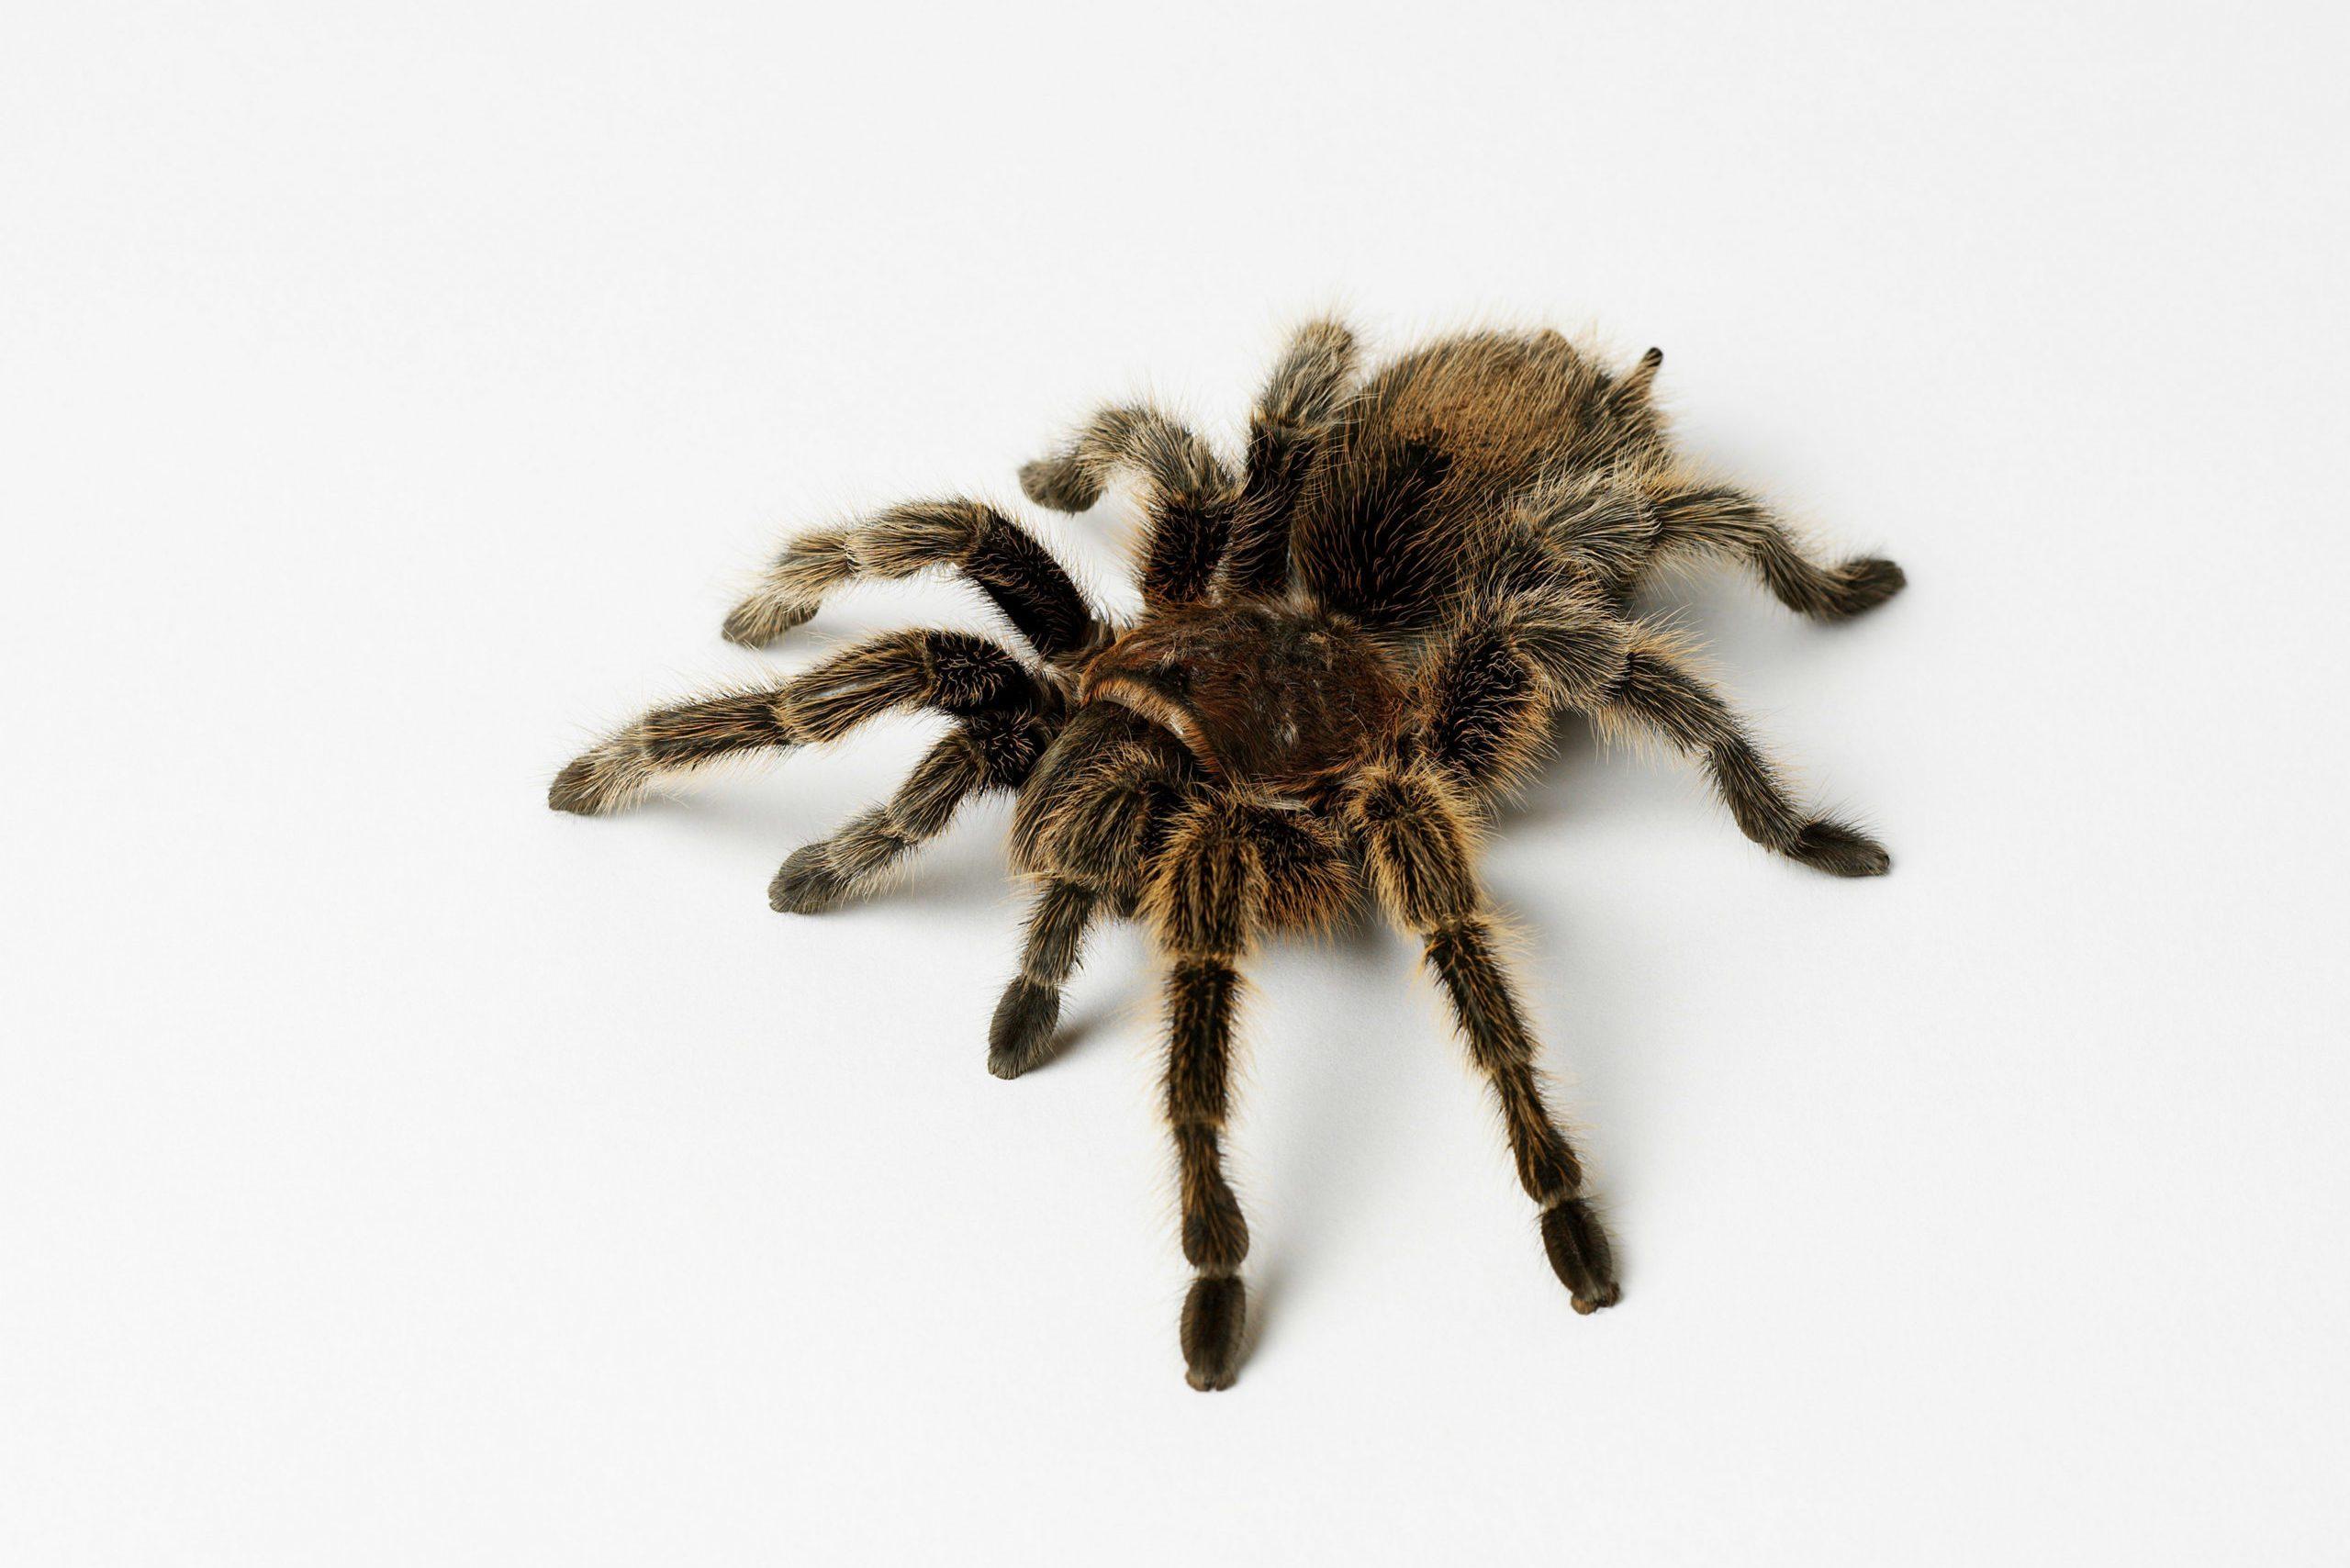 tarantula on white